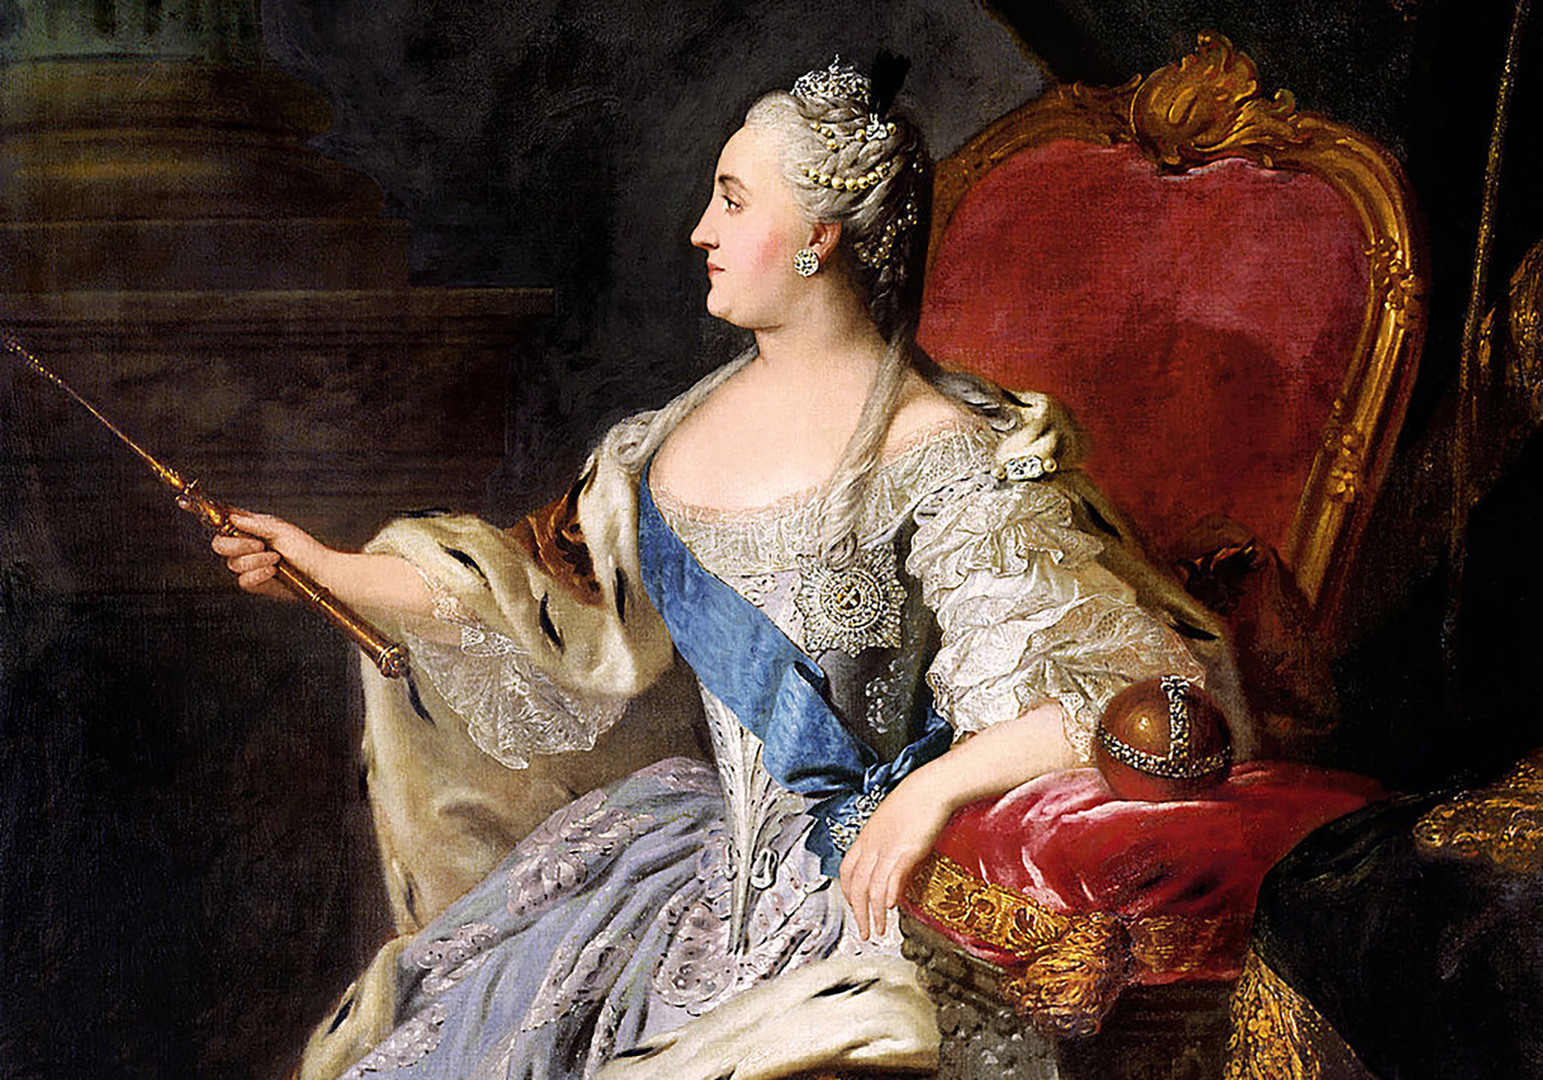 Екатерина II. Уметникот: Фјодор Рокотов